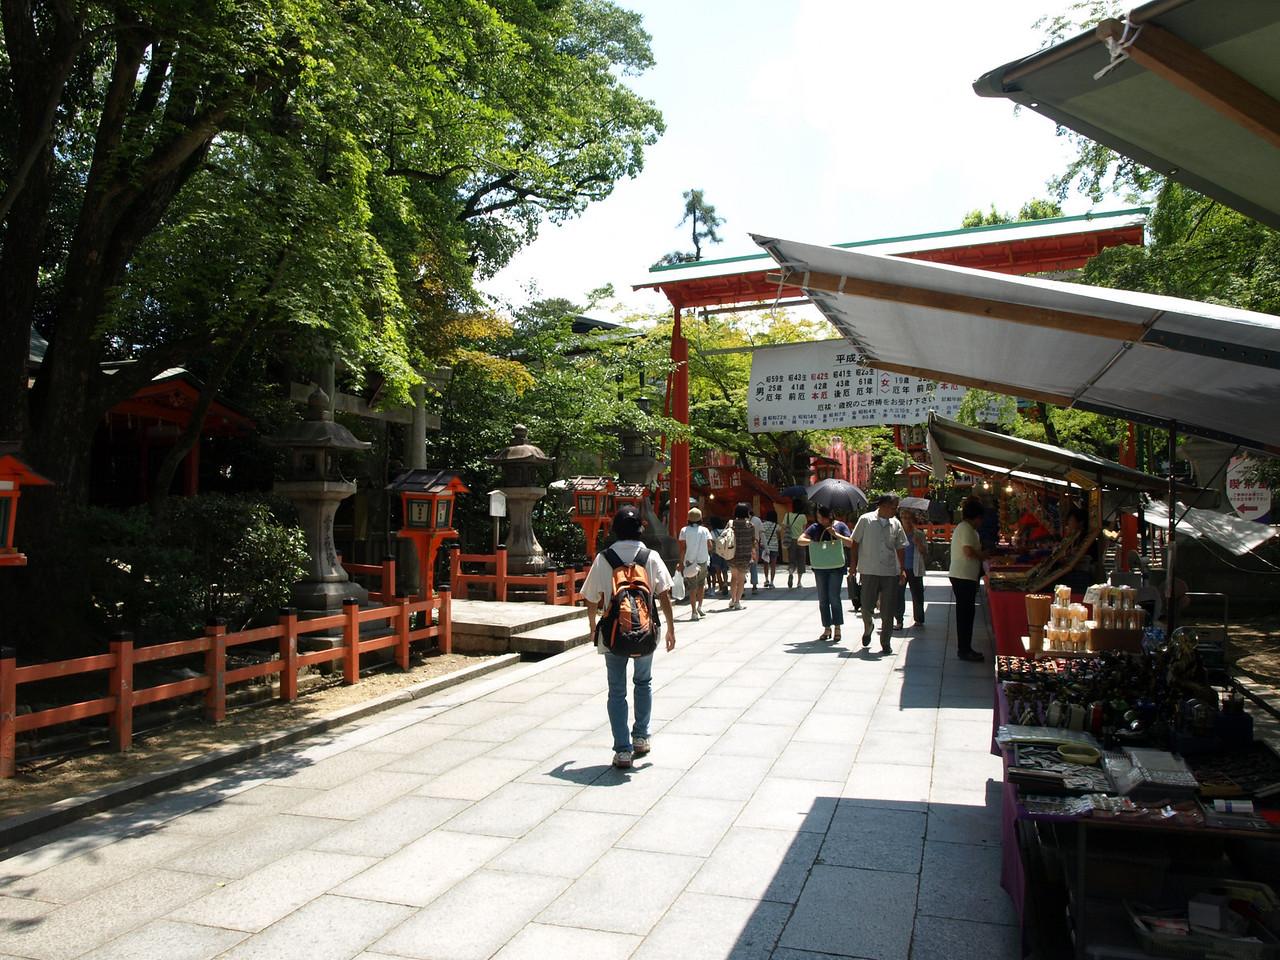 We walk towards the center of the Yasaka Shrine